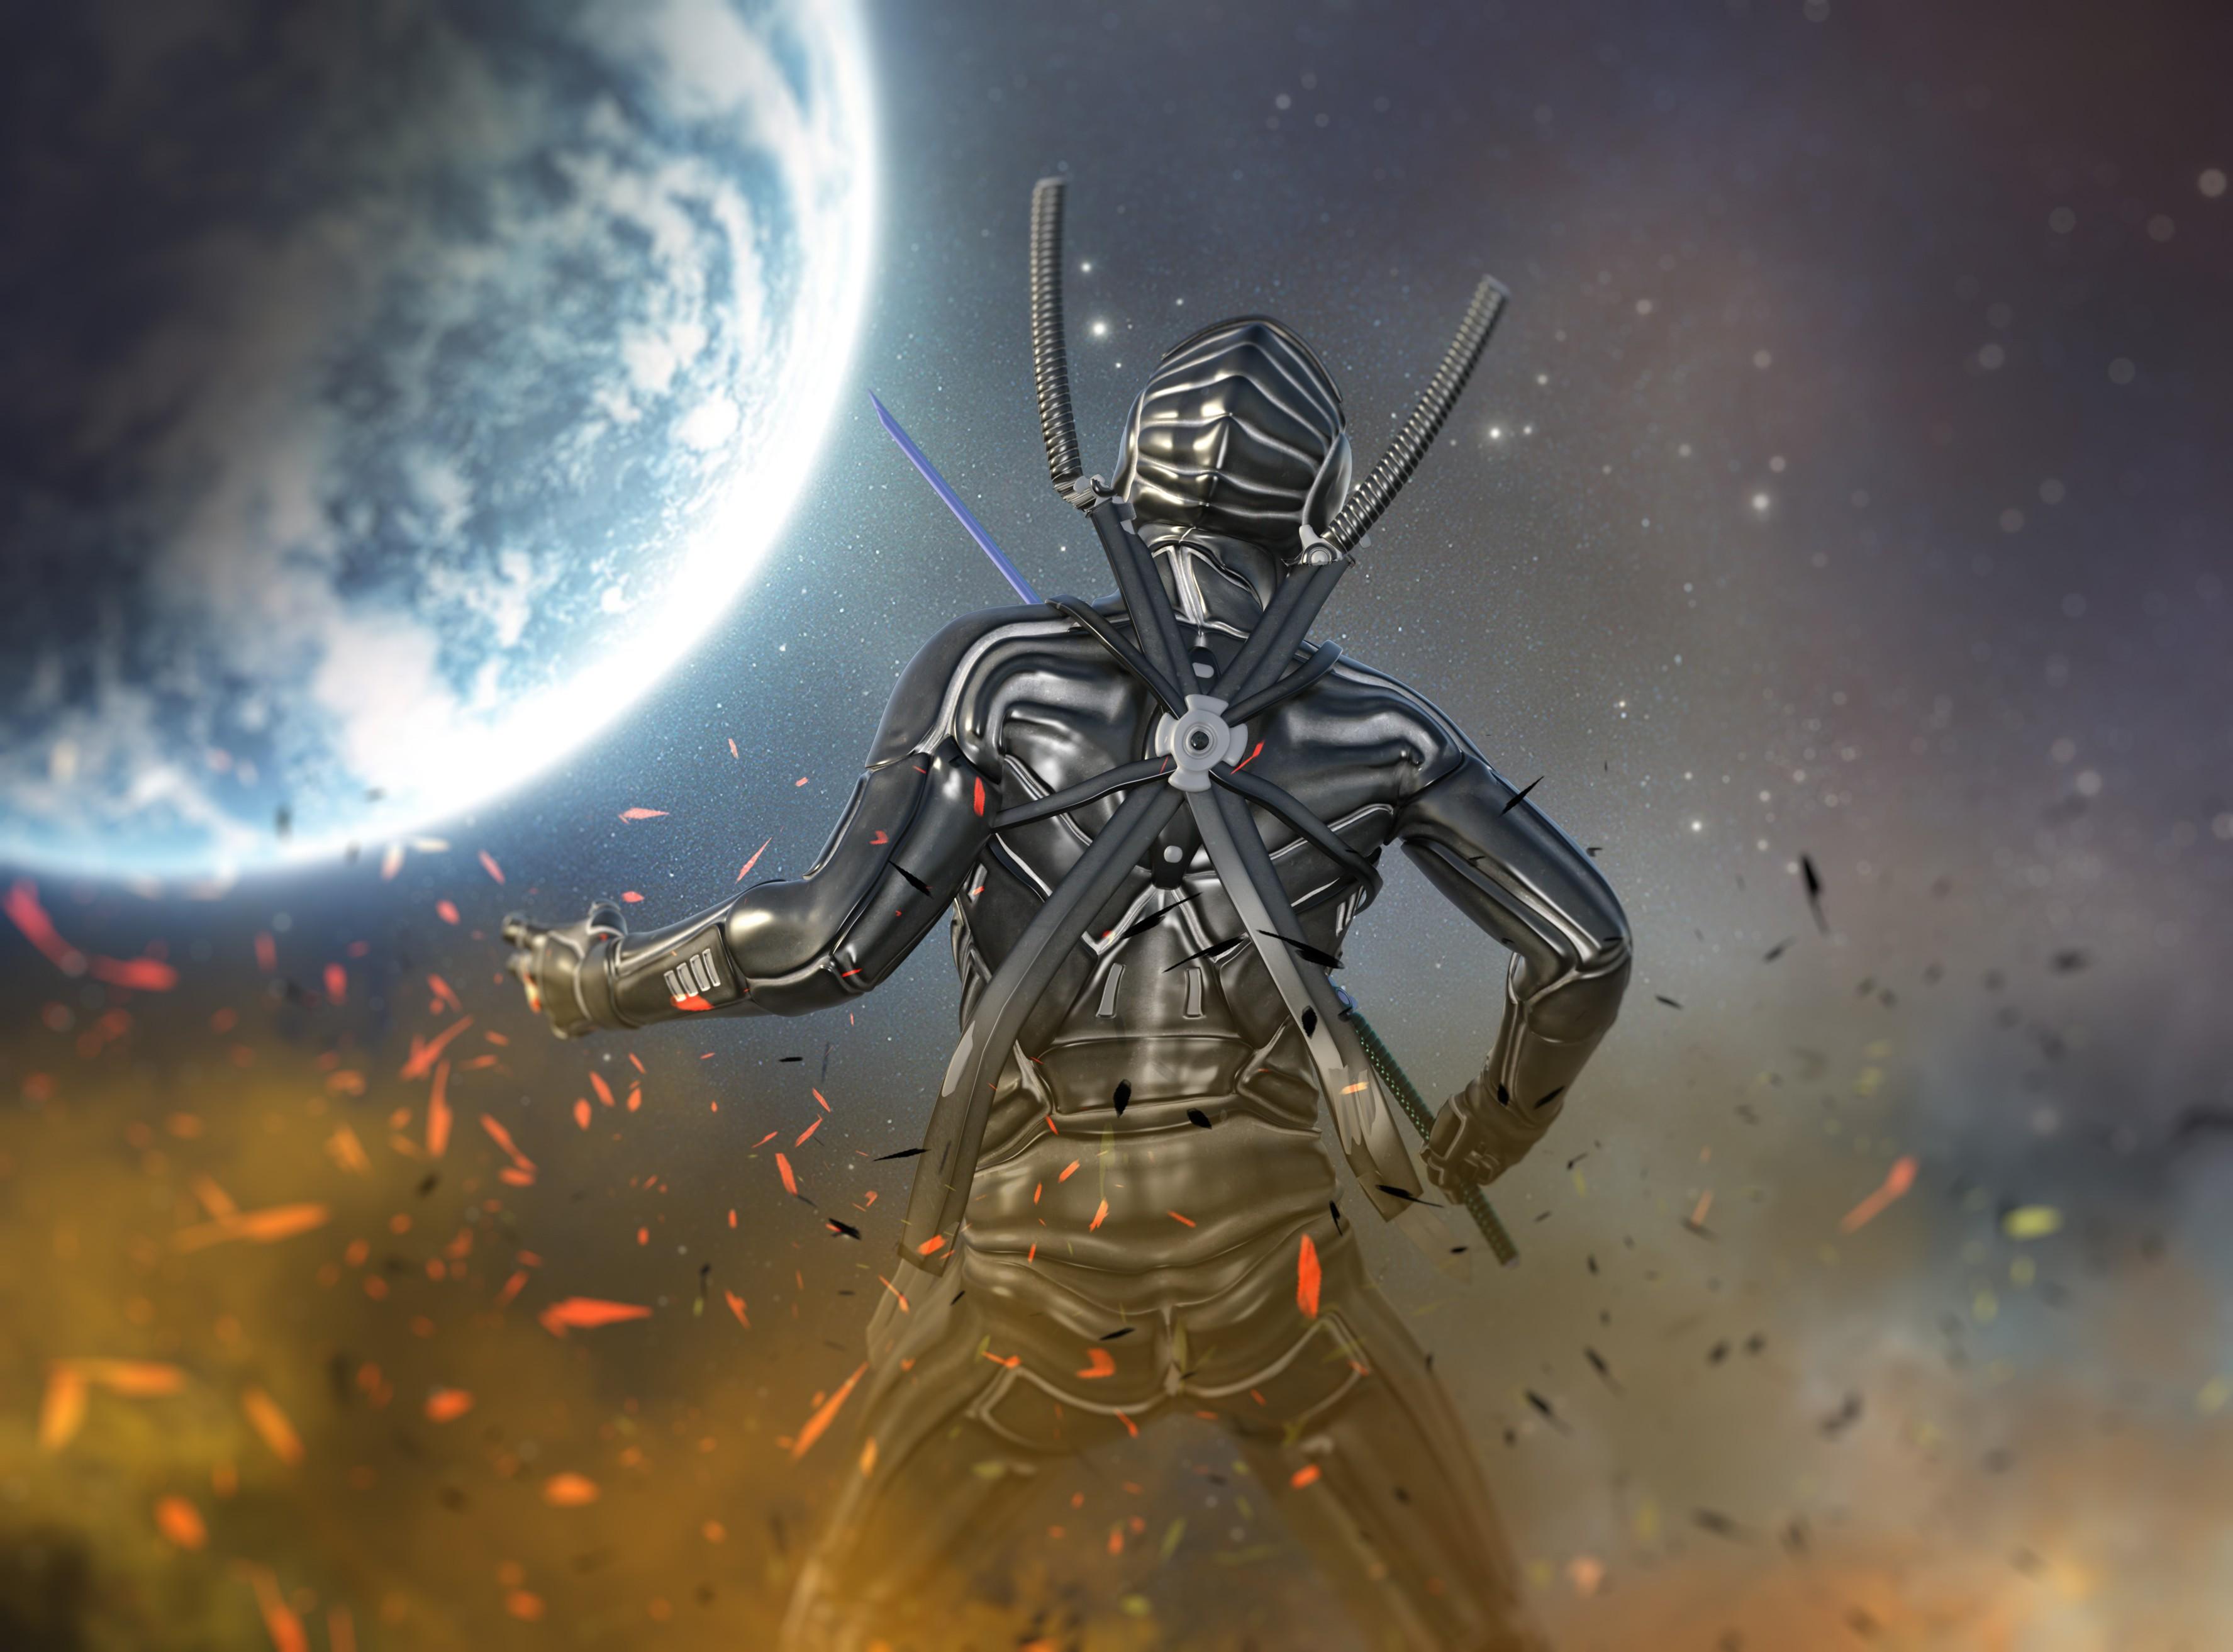 esports and gaming ninjastyle illustrations